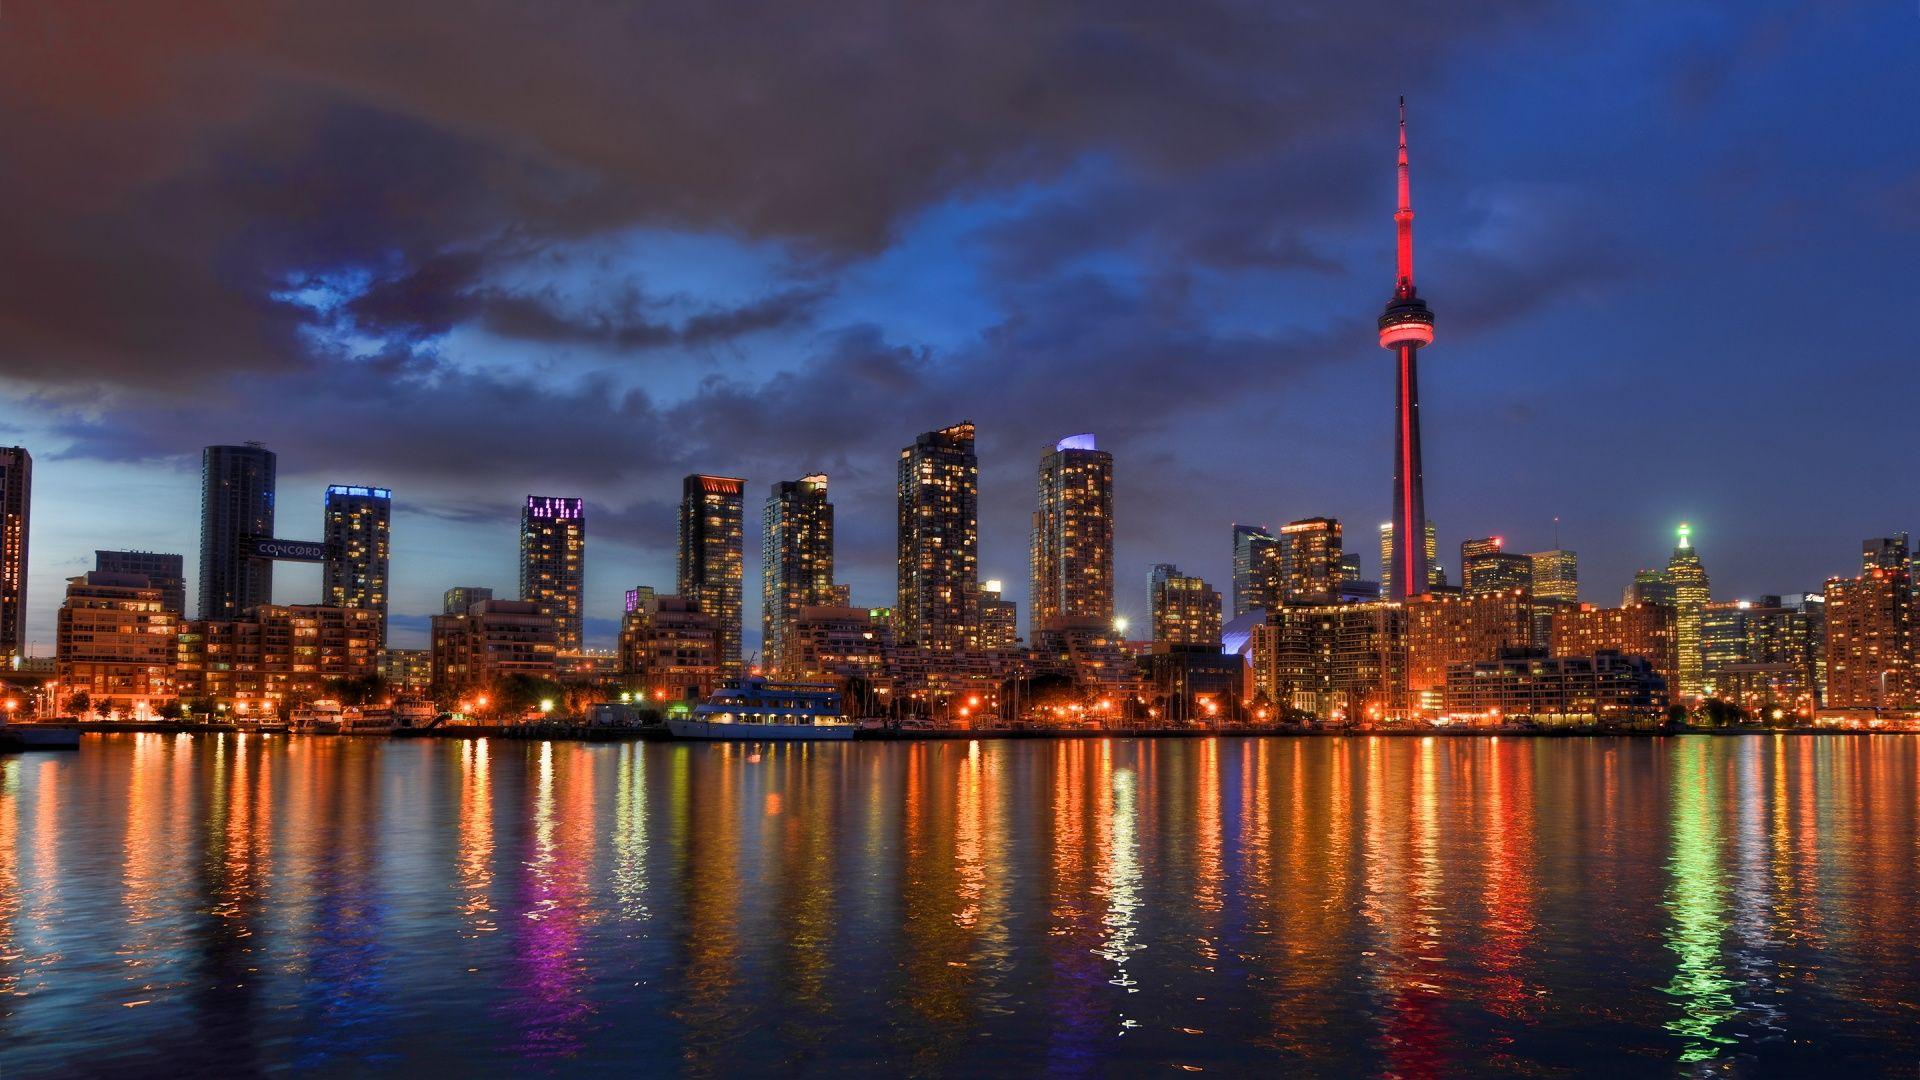 Toronto picture image